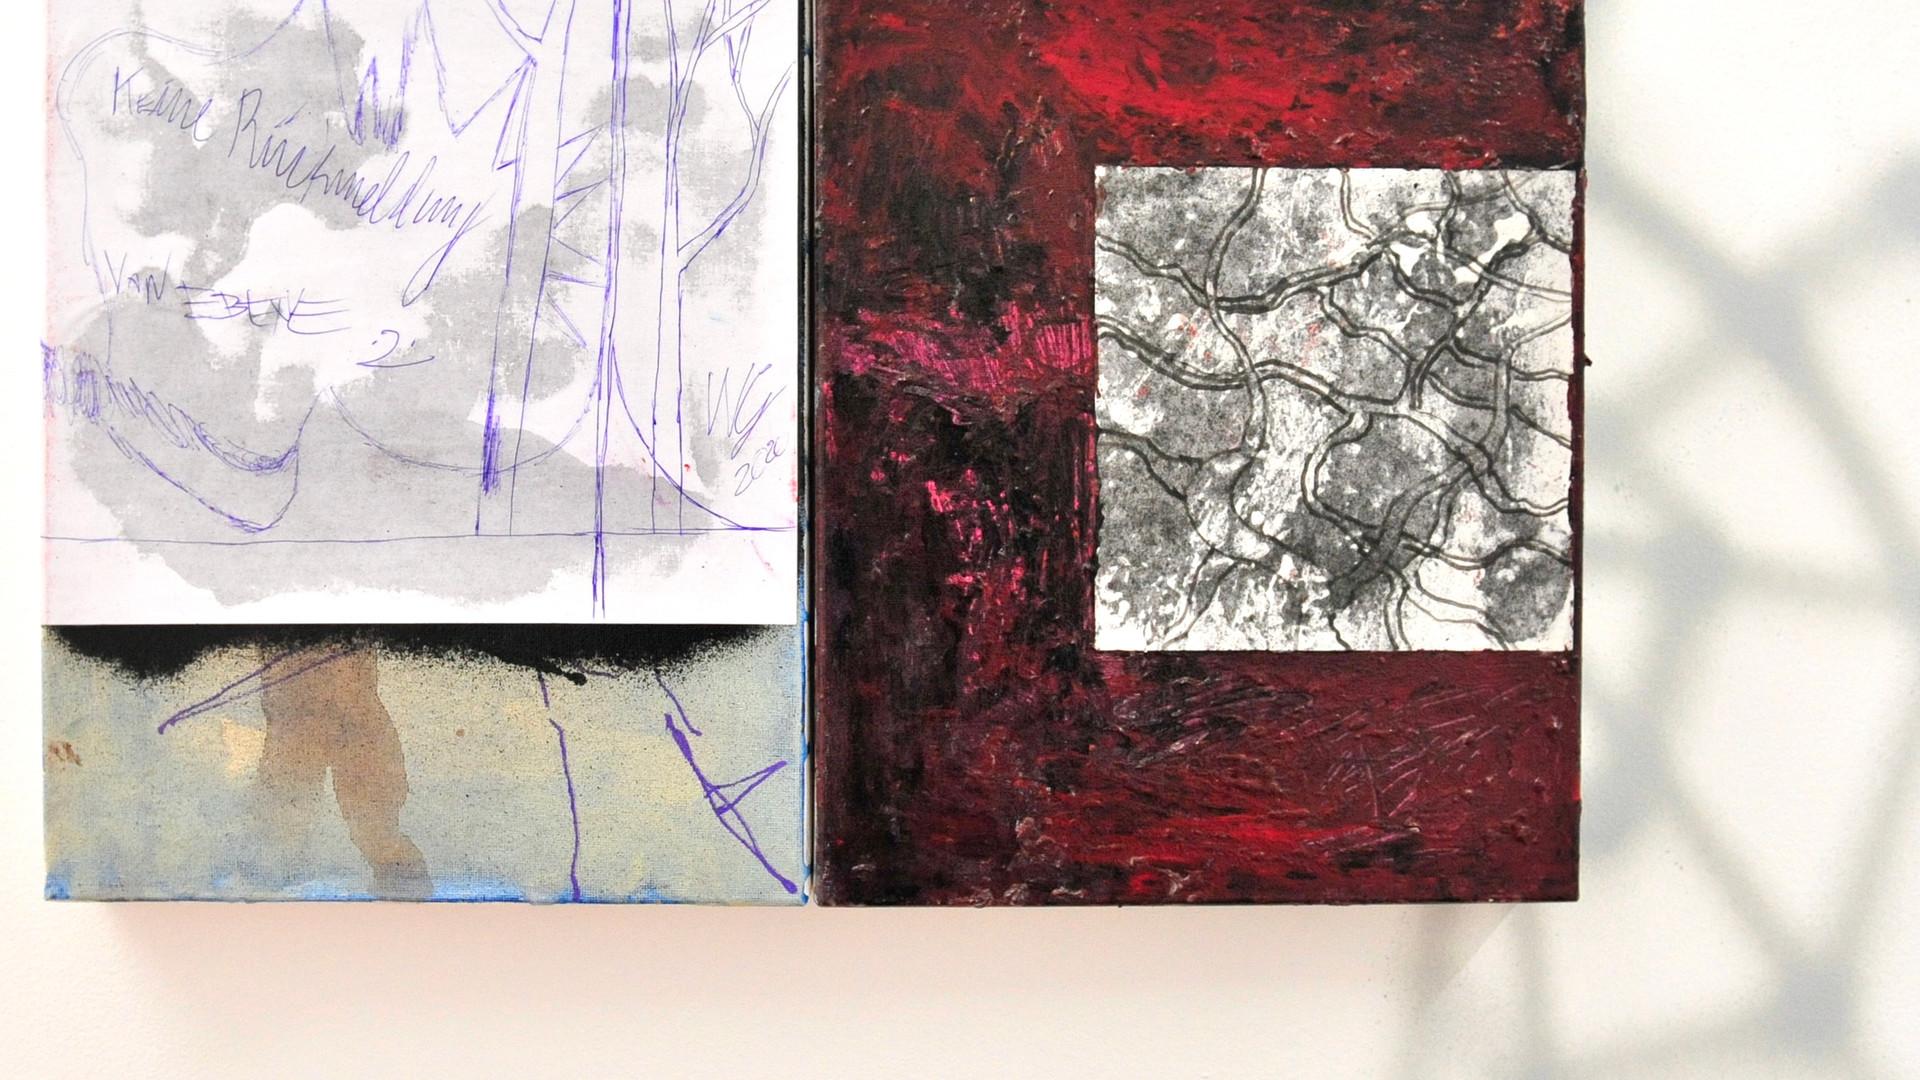 Ohne Titel / 2020 / 30x24cm / Acryl, Lack auf Leinwand   --  Ohne Titel / 2020 / 30x24cm / Acryl, Lack auf Leinwand   --  Wolfgang Günther / Emde Gallery / Soloshow / Mainz, 2020